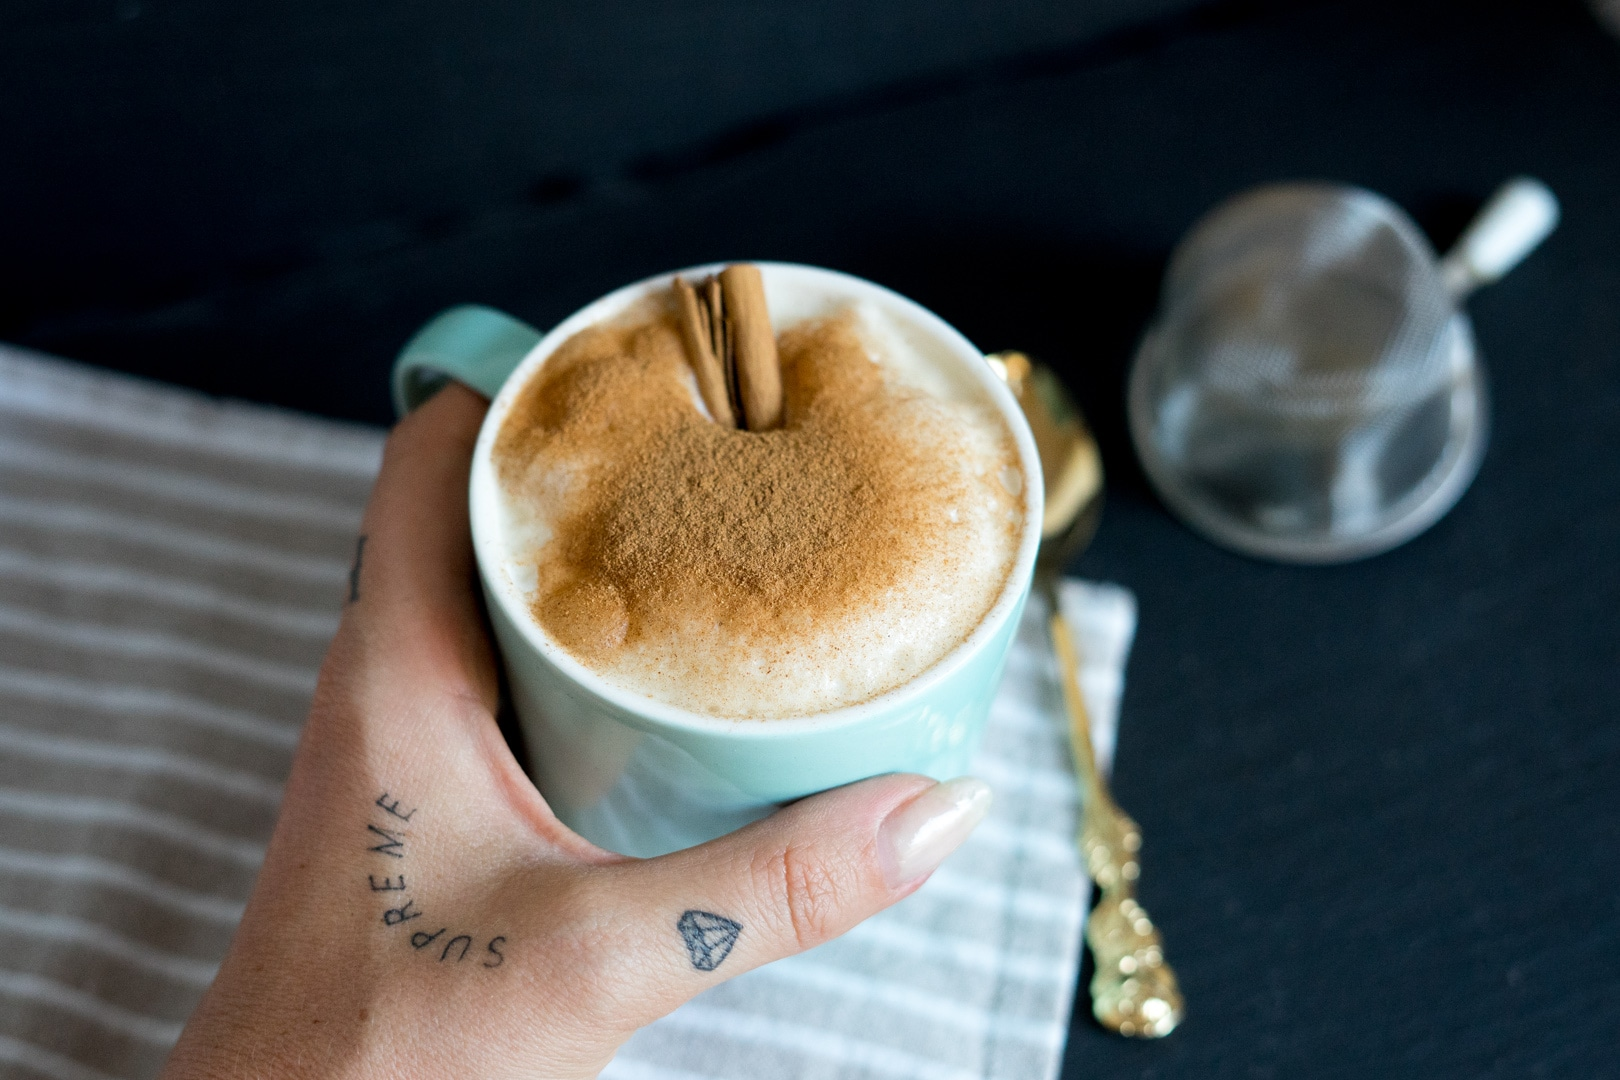 fitnessblog-fitnessblogger-fitness-blog-blogger-stuttgart-dreamteamfitness-snickerdoodle-latte-protein-more-nutrition